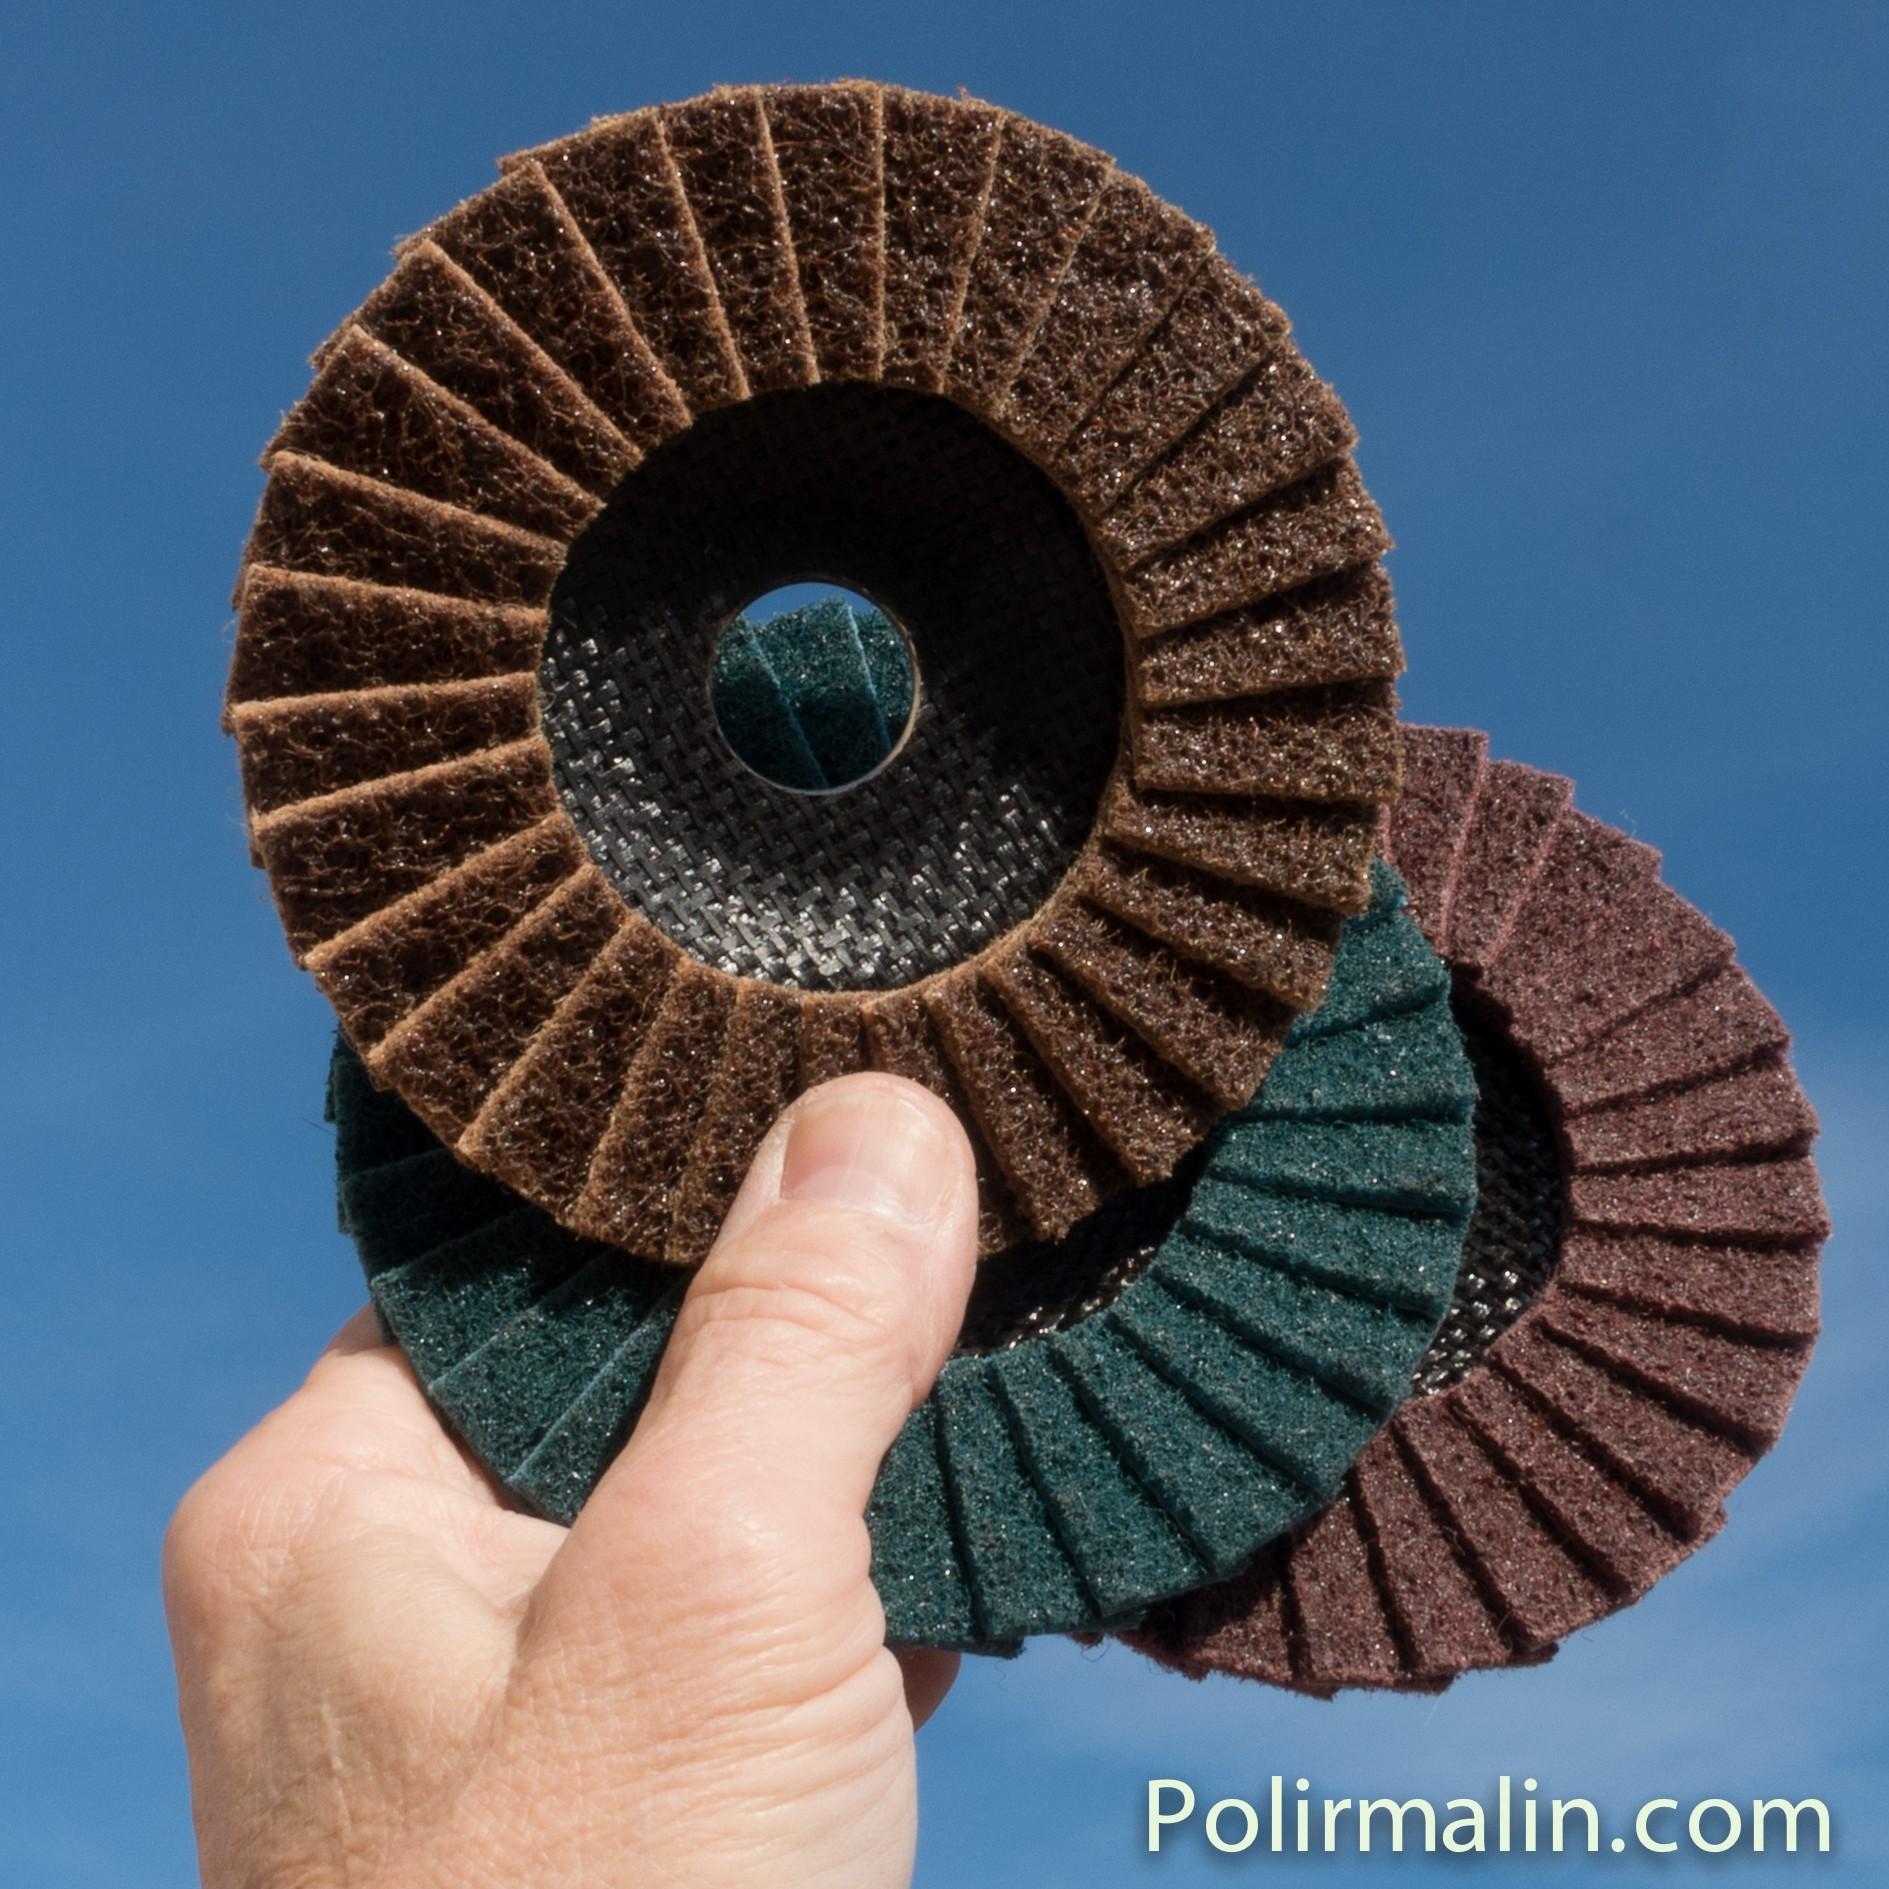 Fluide de polissage  FIN www.polirmalin.com spécialiste du polissage, de l'ébavurage et du brossage